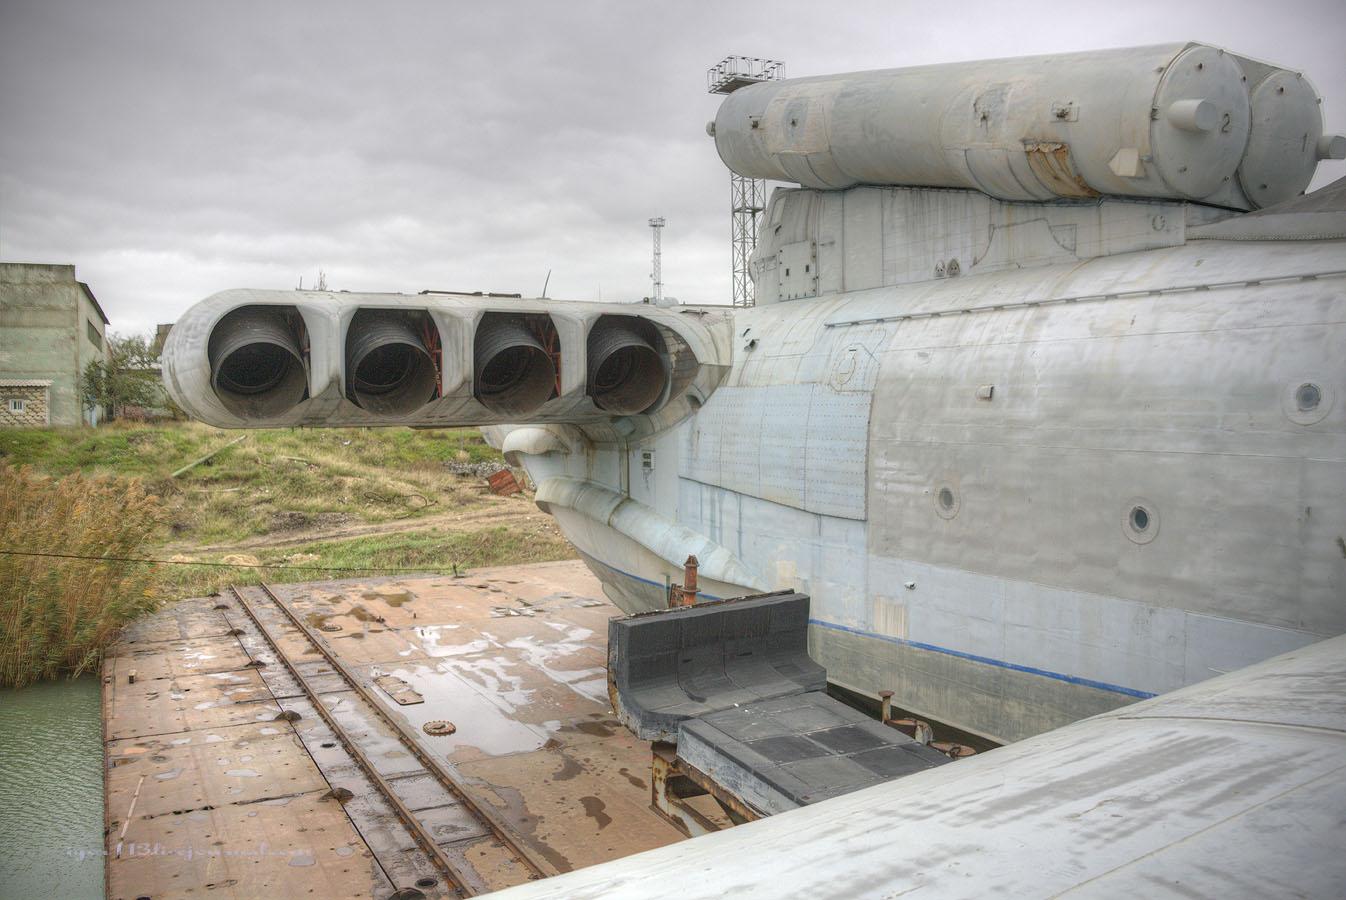 Ekranoplano abandonado 007g5agb